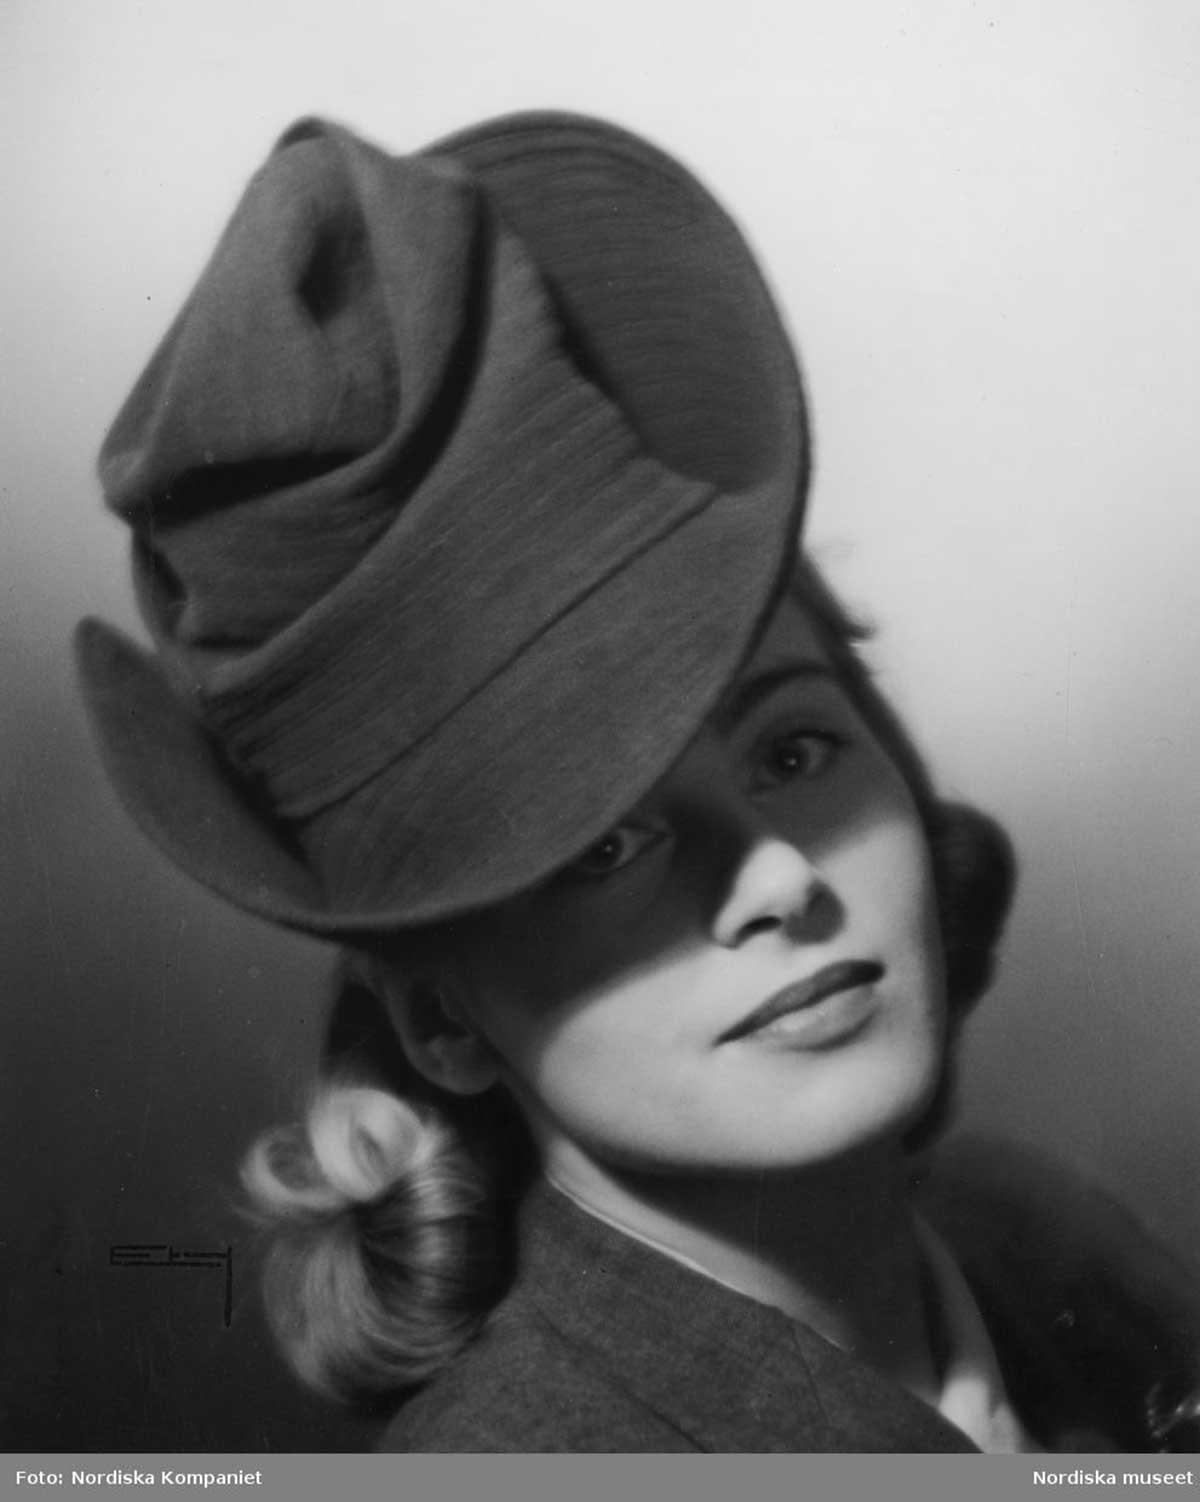 1944 Stetsun hat from Sweden